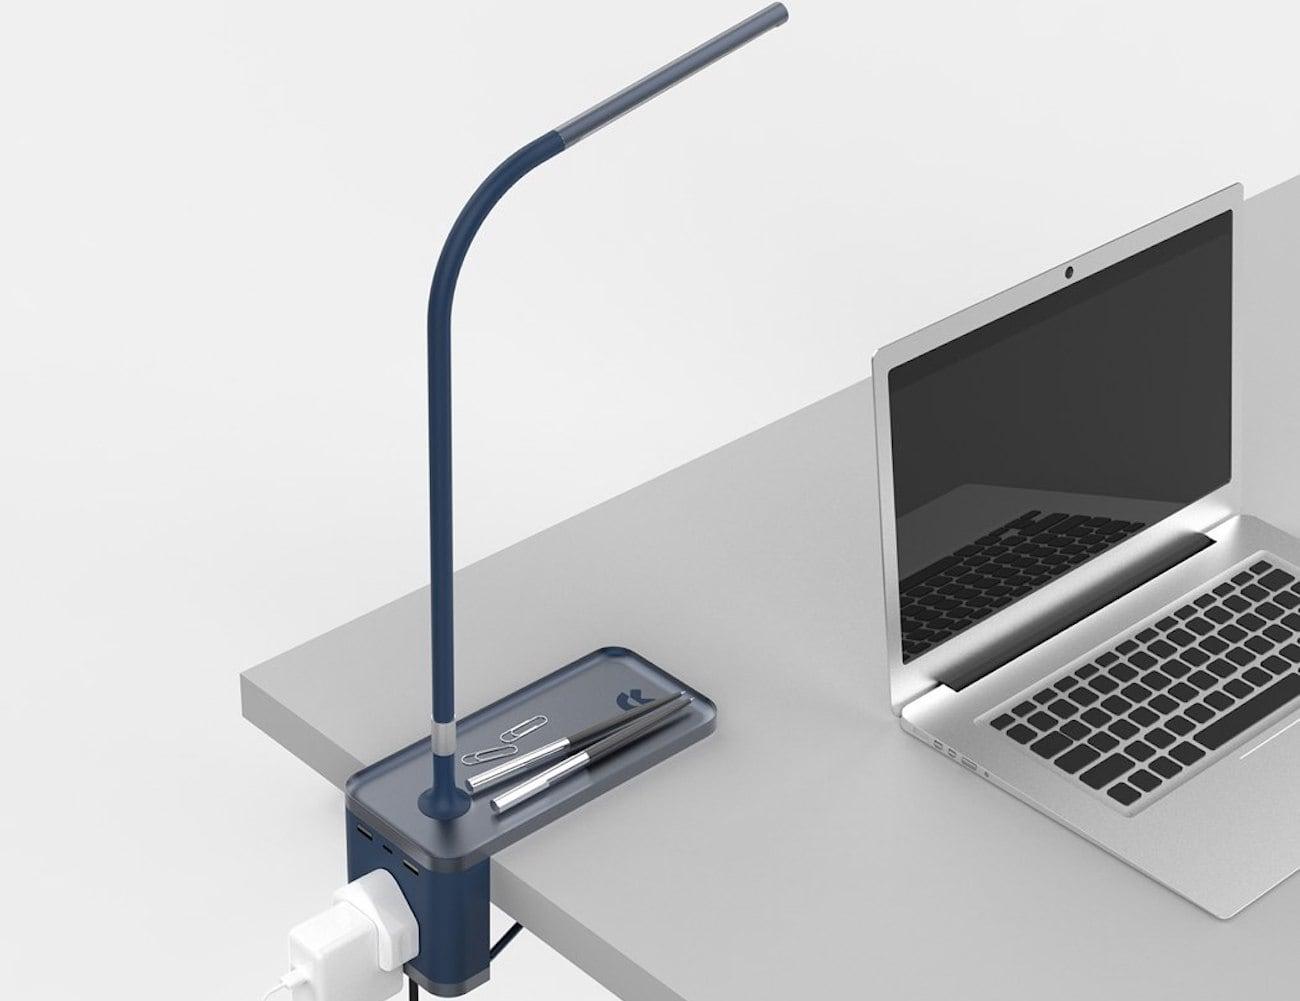 NIOXCSM Wireless Charging Light eliminates unsightly cords